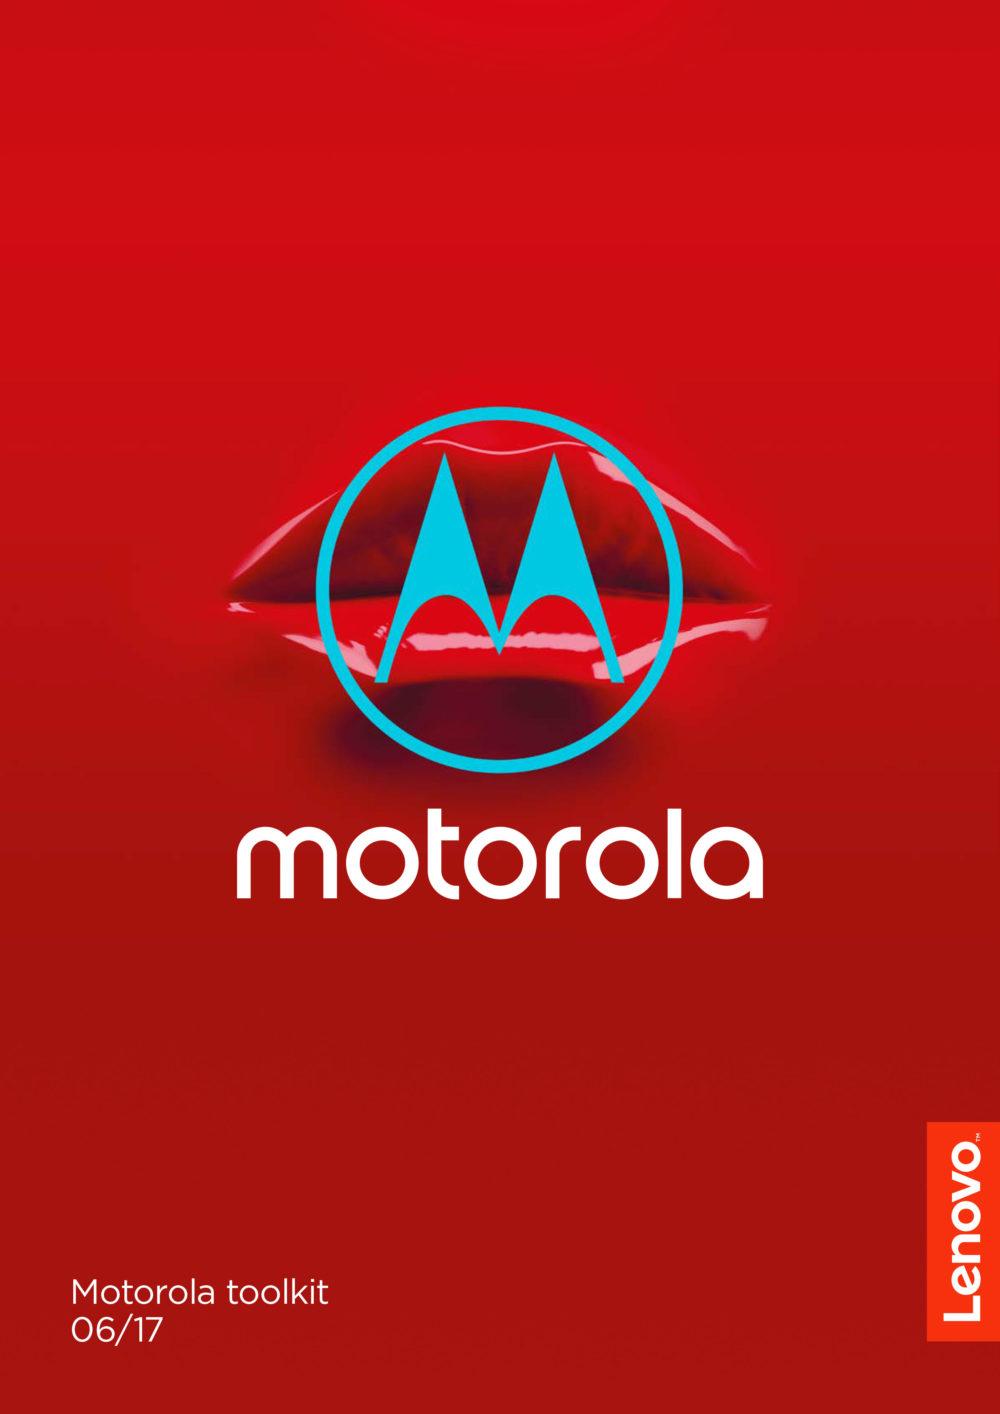 motorola pdf document branding style guides motorola pdf document branding